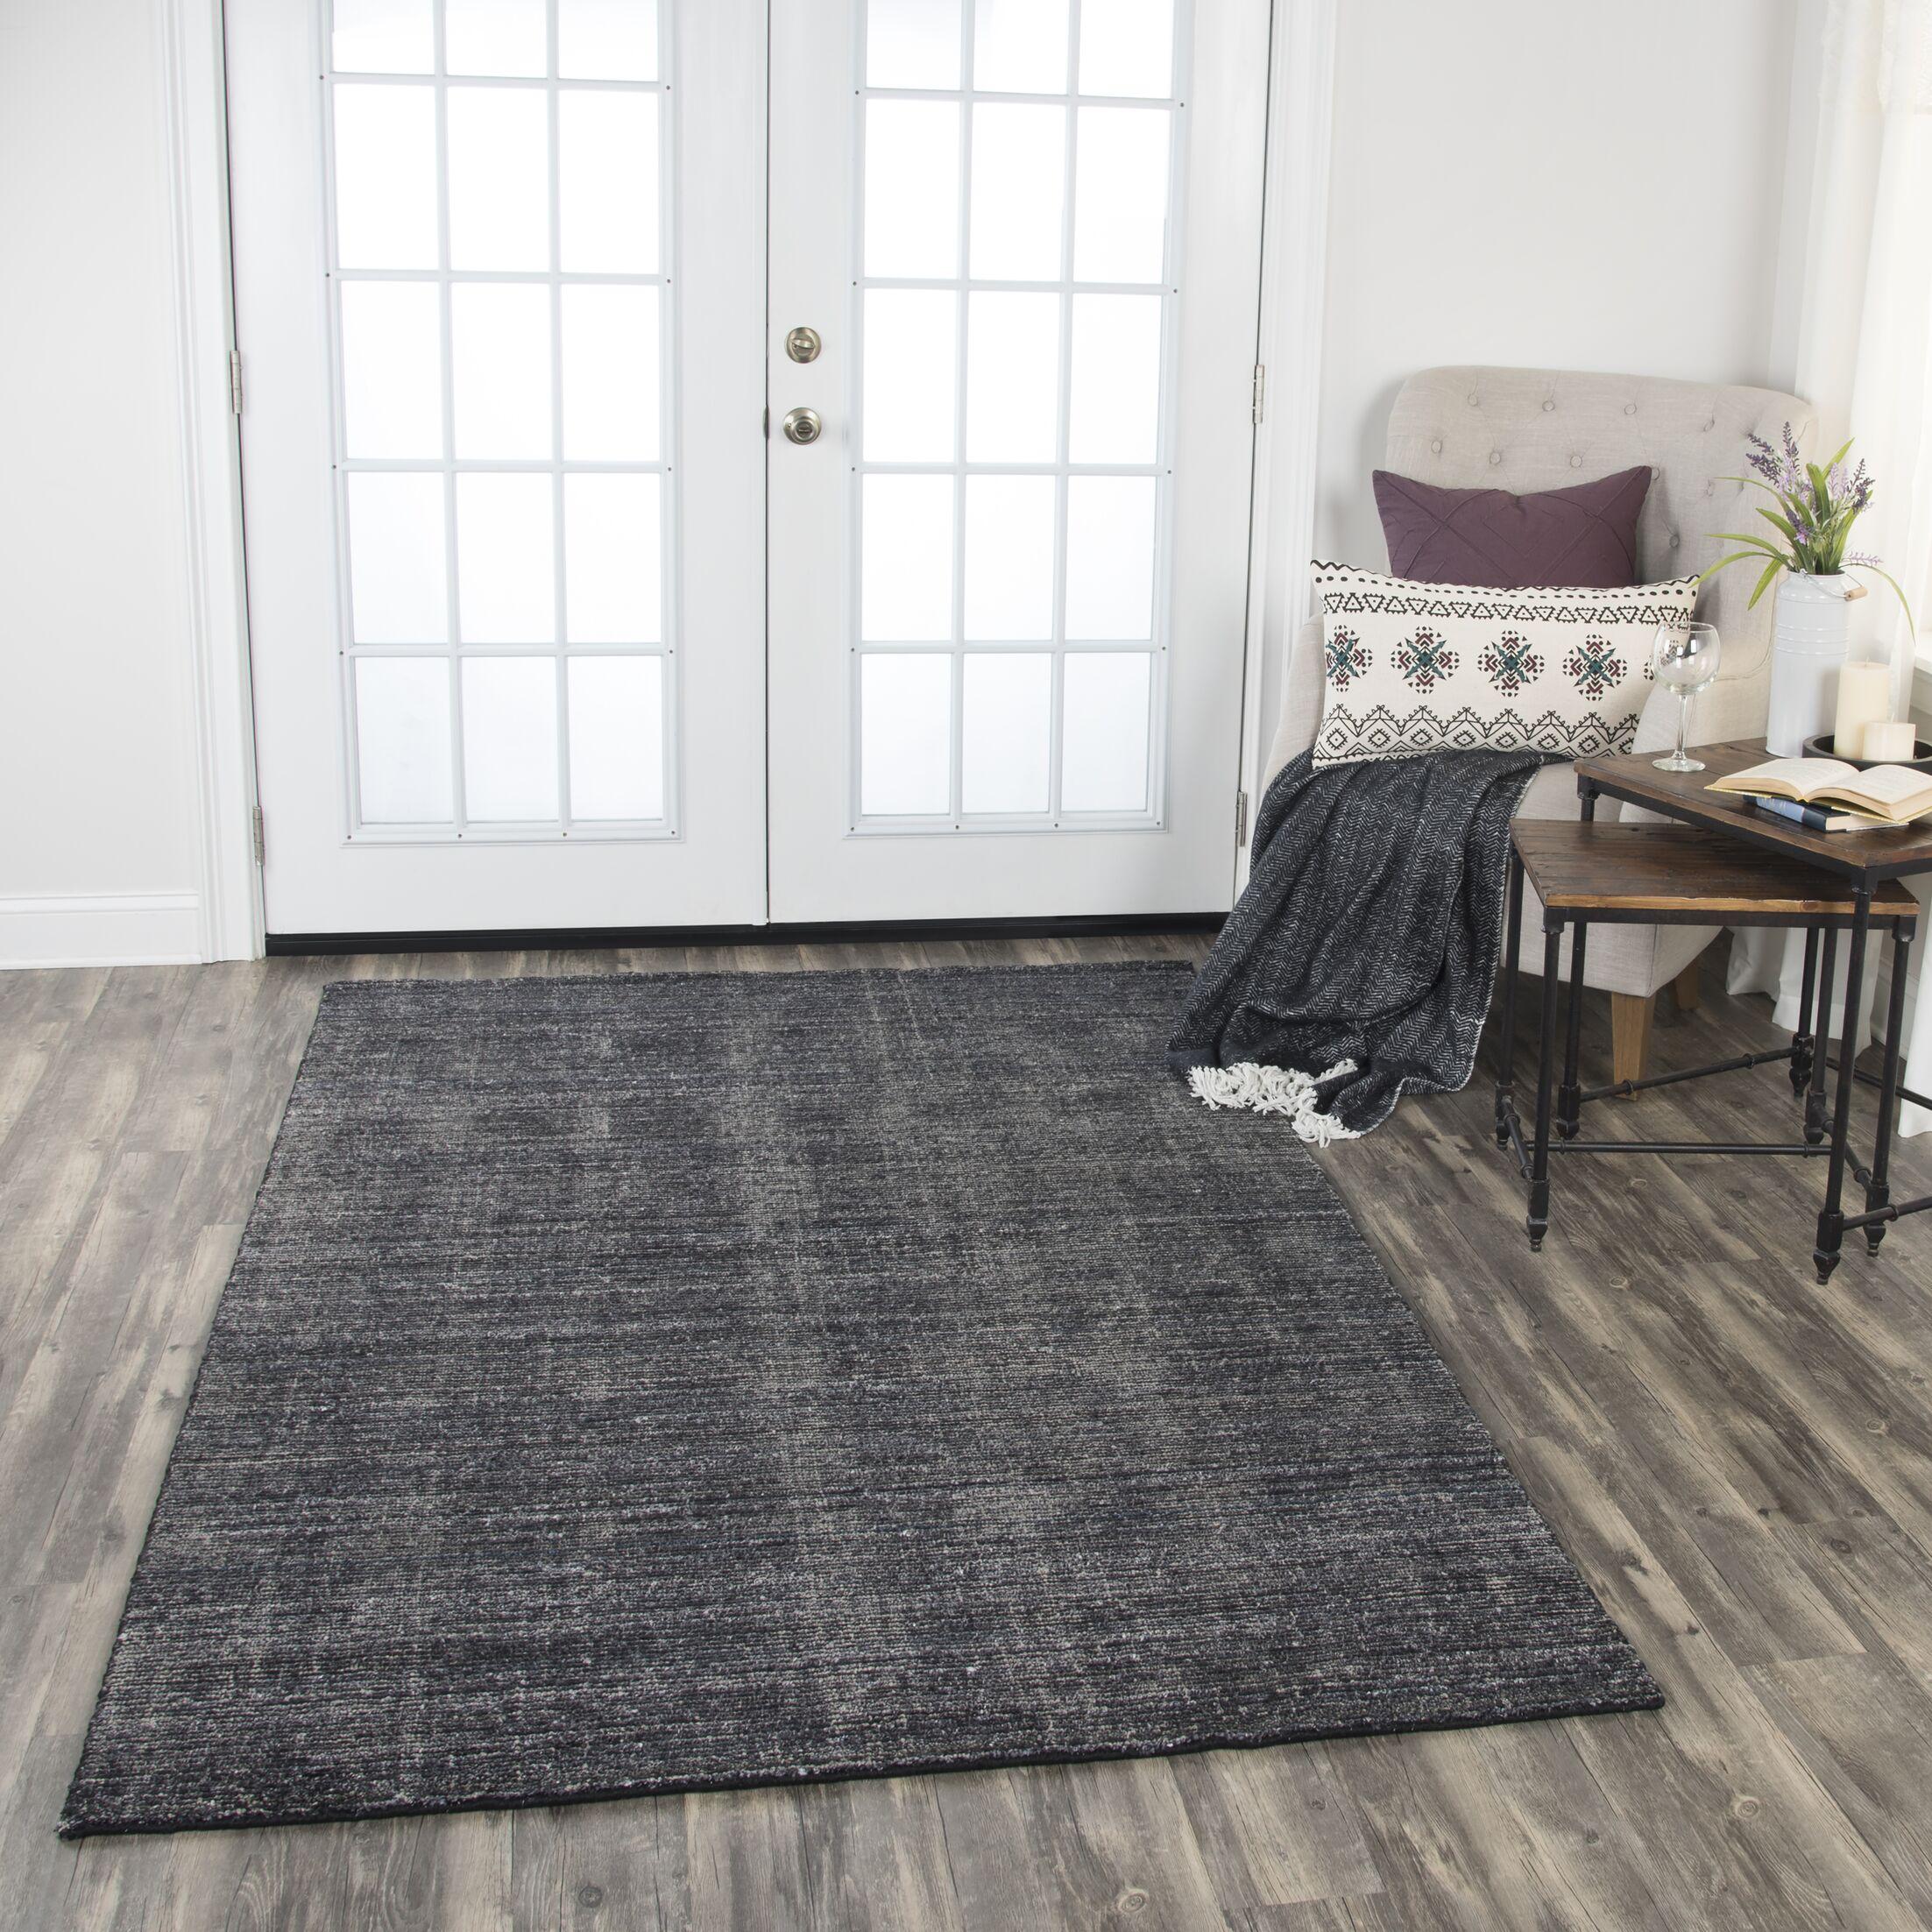 Hadley Hand-Woven Charcoal Area Rug Rug Size: Rectangle 8' x 10'